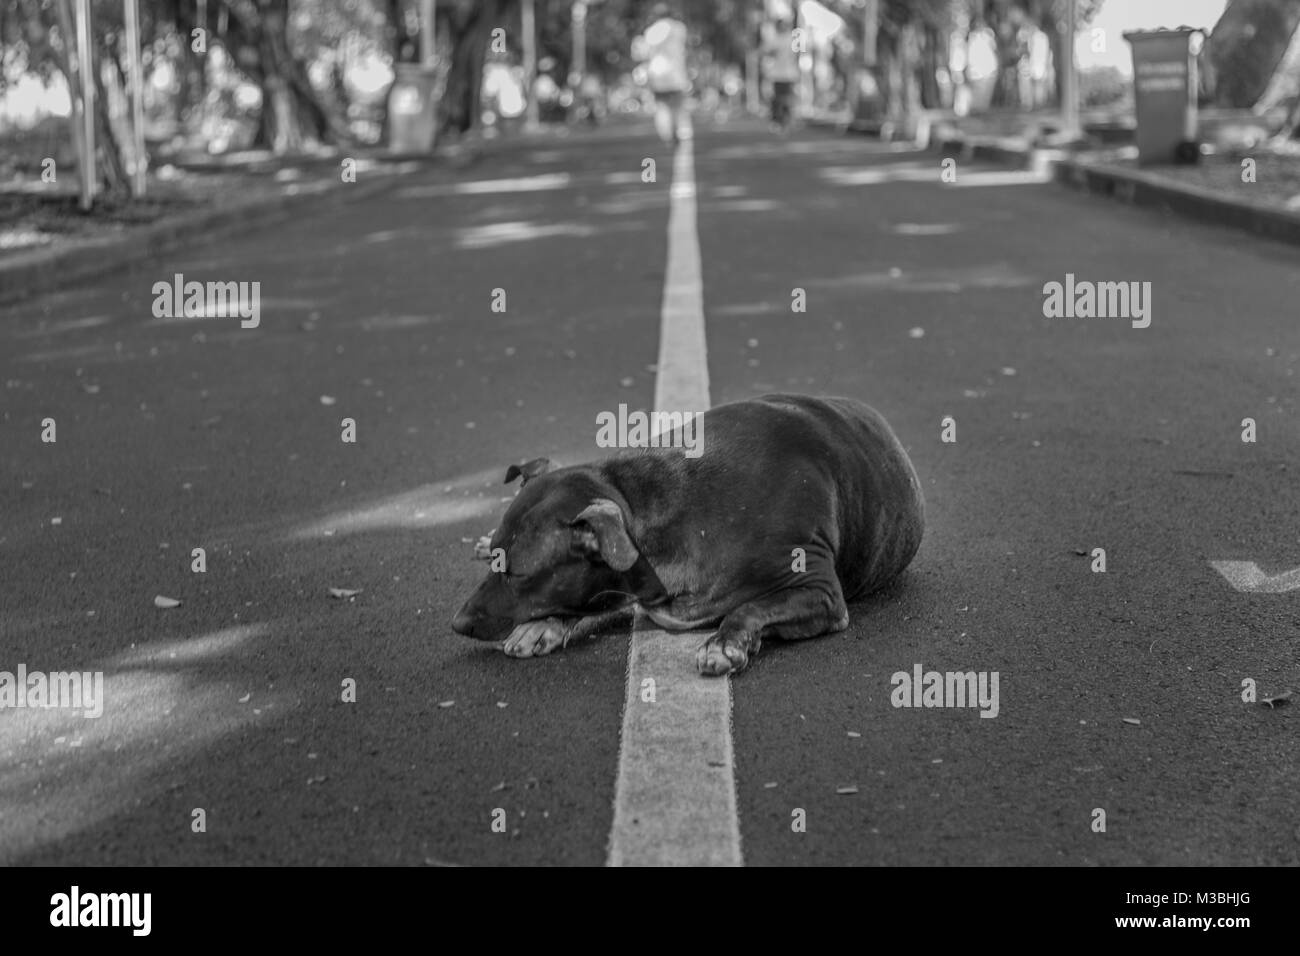 a dog sleeping in a park in Bangkok, Thailand - Stock Image